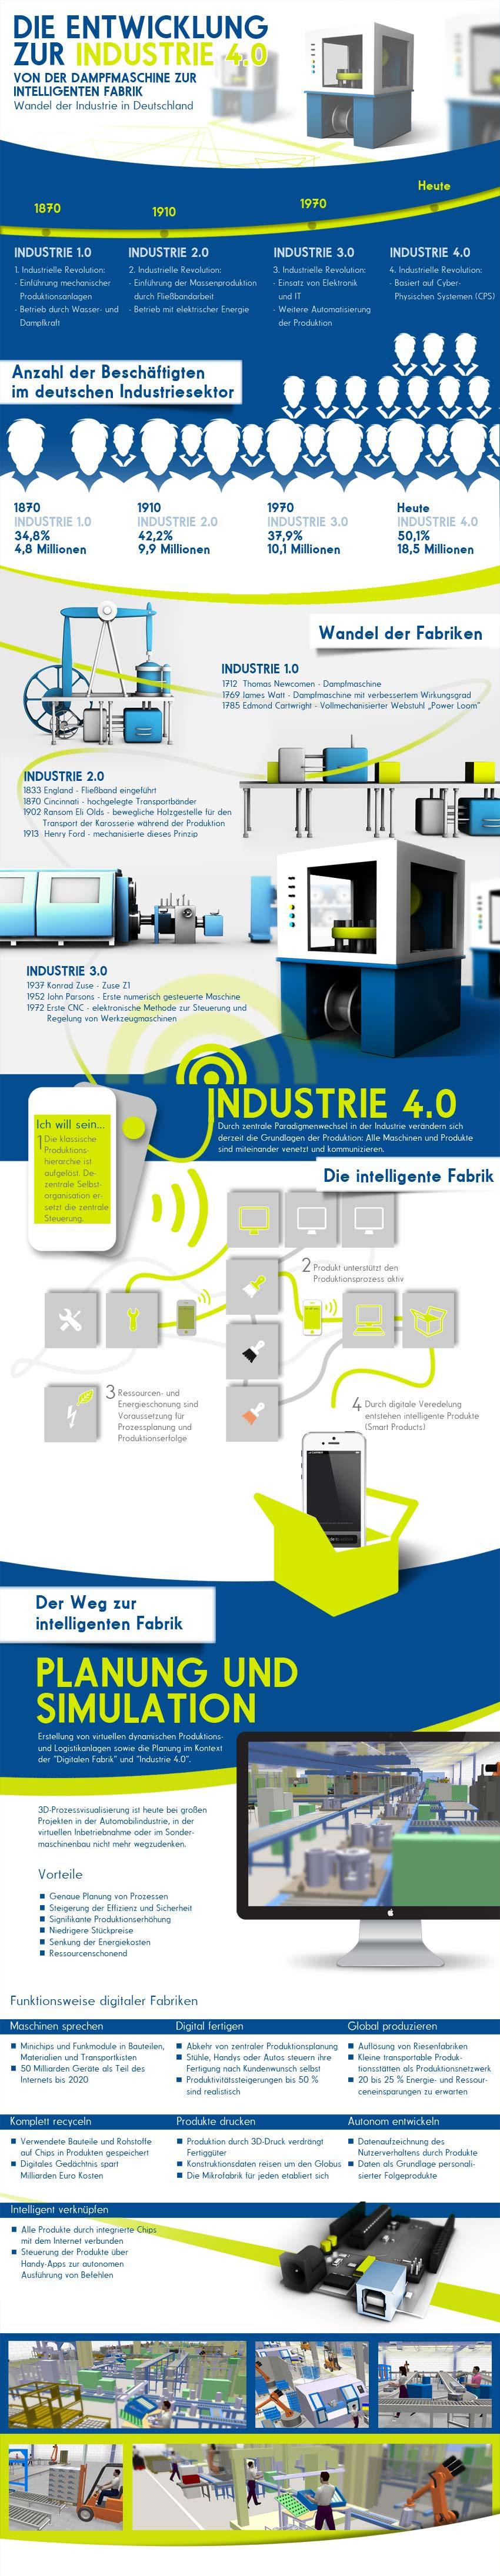 Industrie 4.0 Infografik